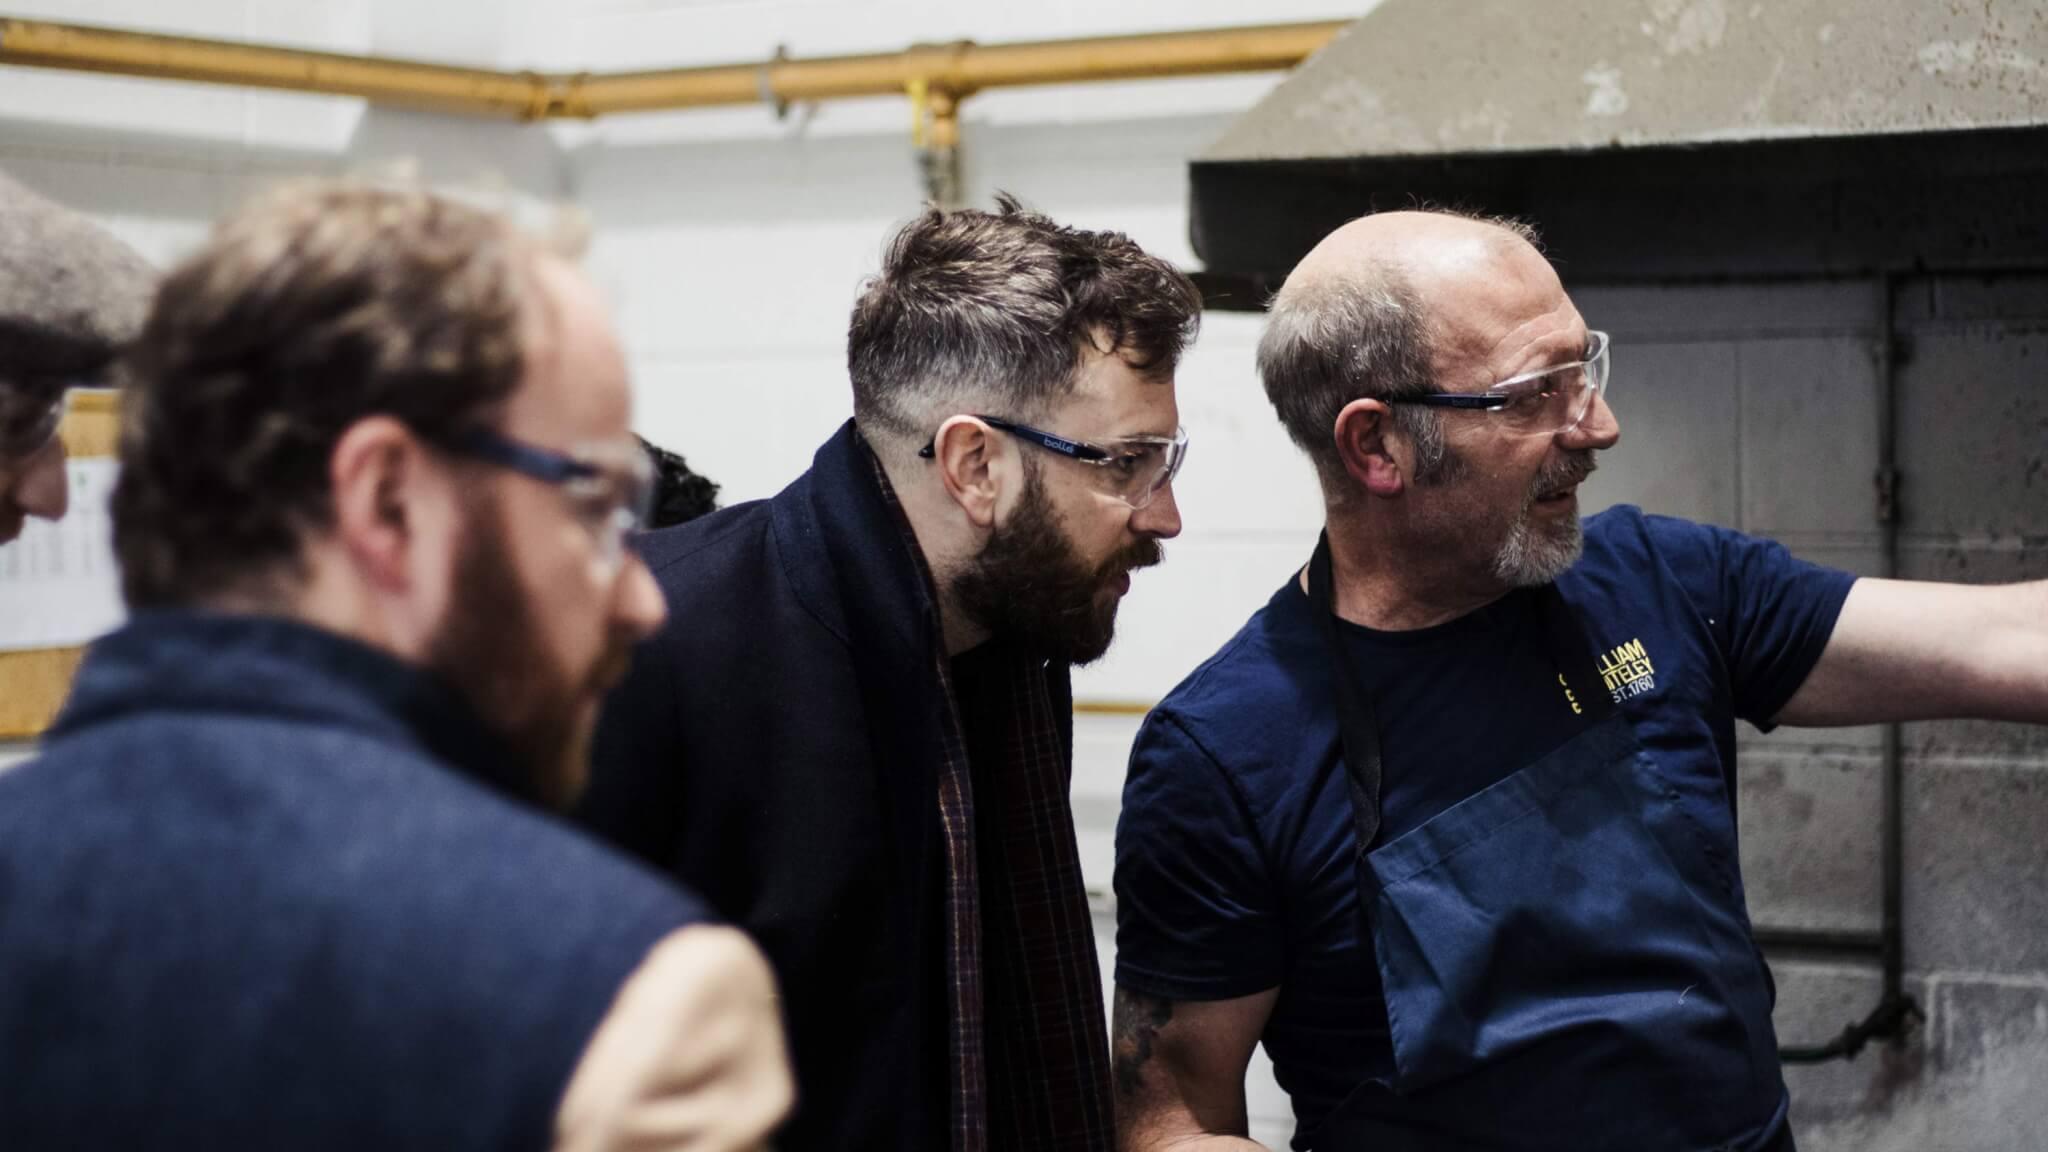 meeting-the-bespoke-tailoring-shears-makers